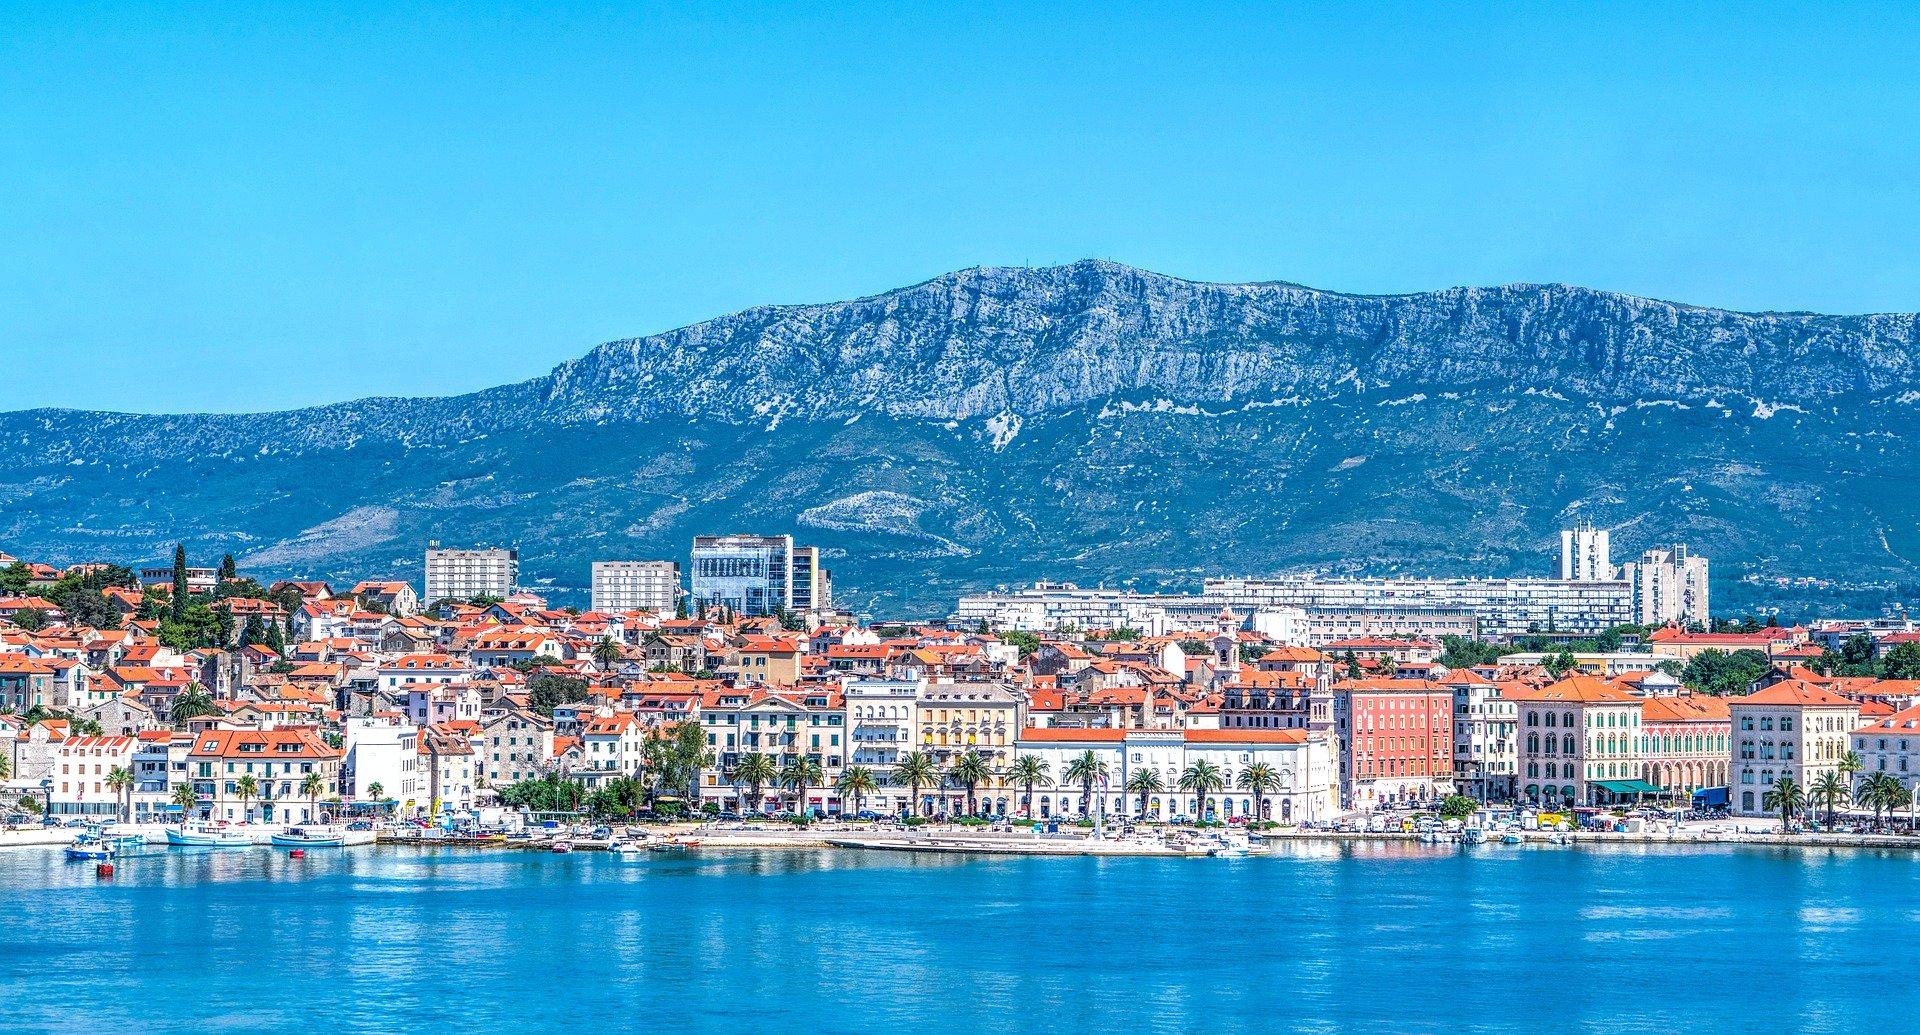 split airport to city, split airport transfers, split airport bus, split airport shuttle, split airport to city center, How To Get From Split Airport to City Center